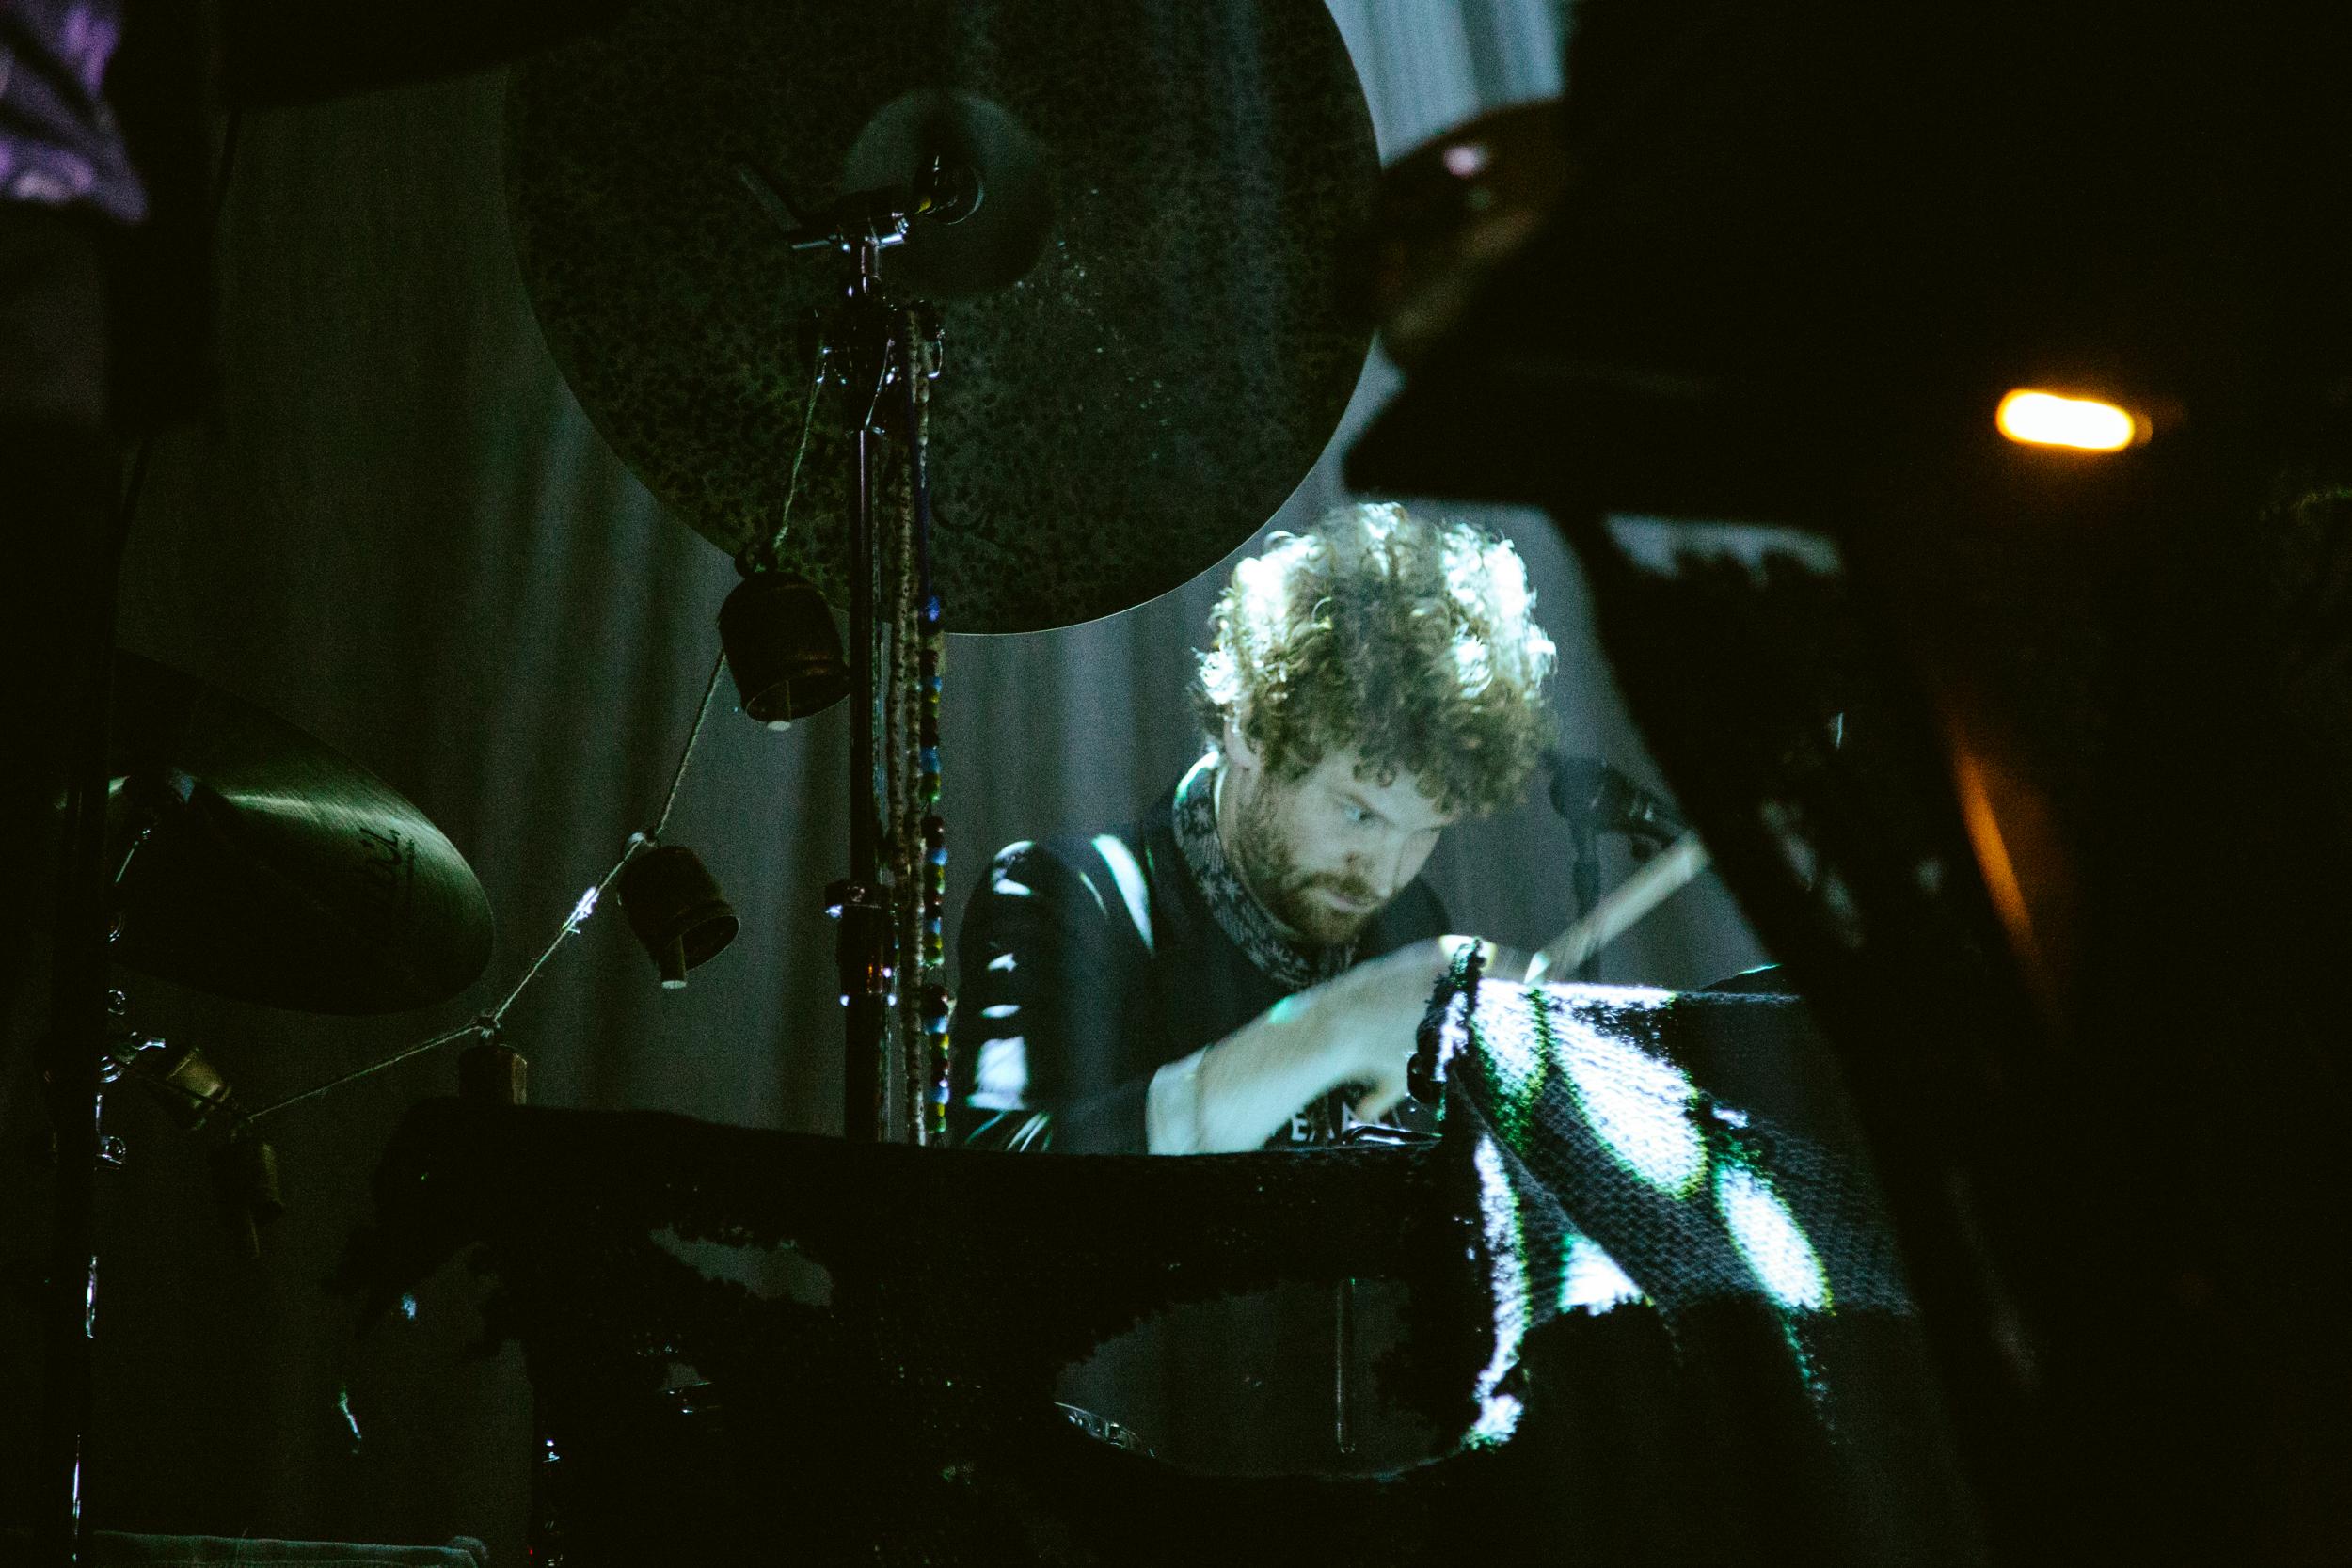 Nick Murphy at 9:30 (Photo by Carolina Correa-Caro)